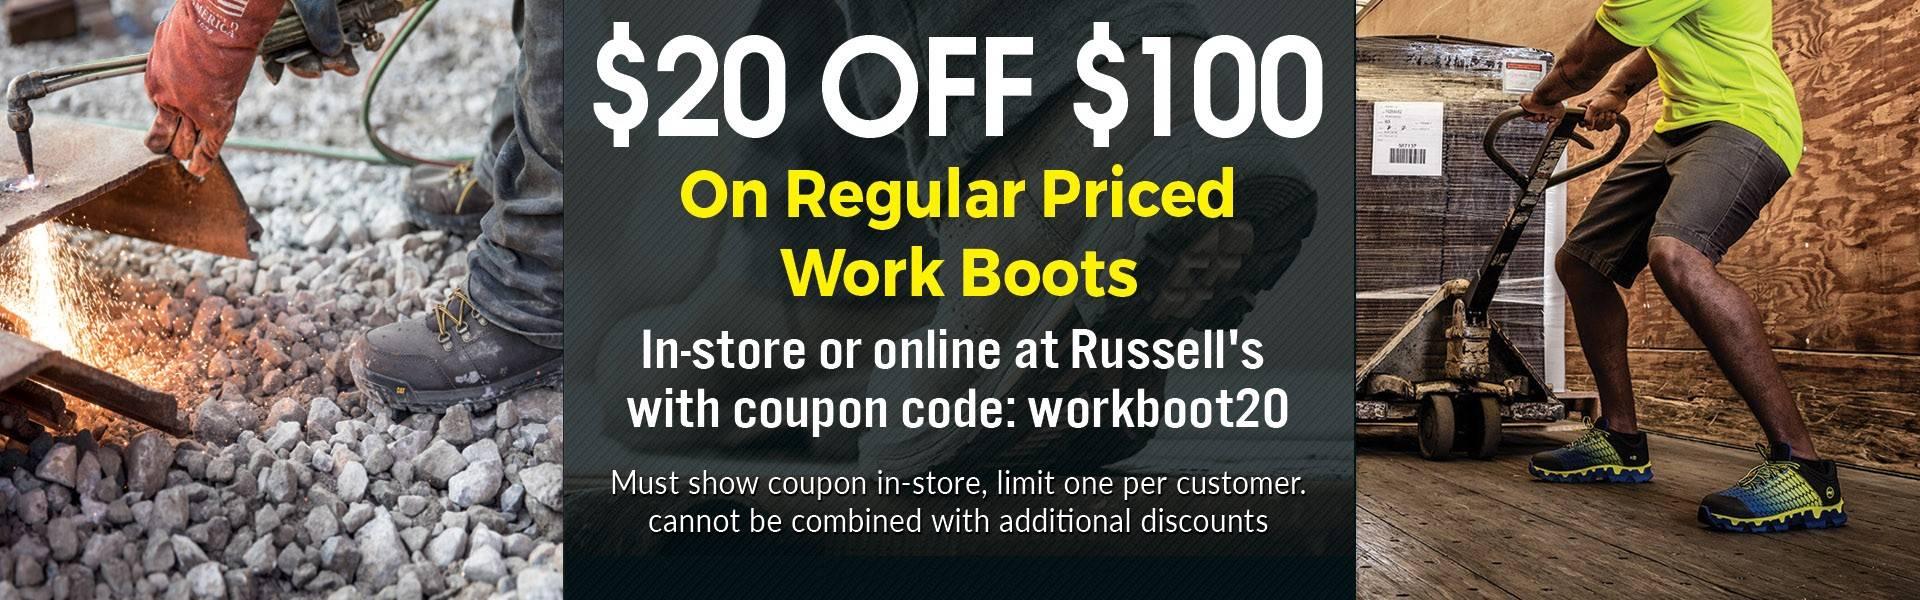 Work Coupon code: workboot20